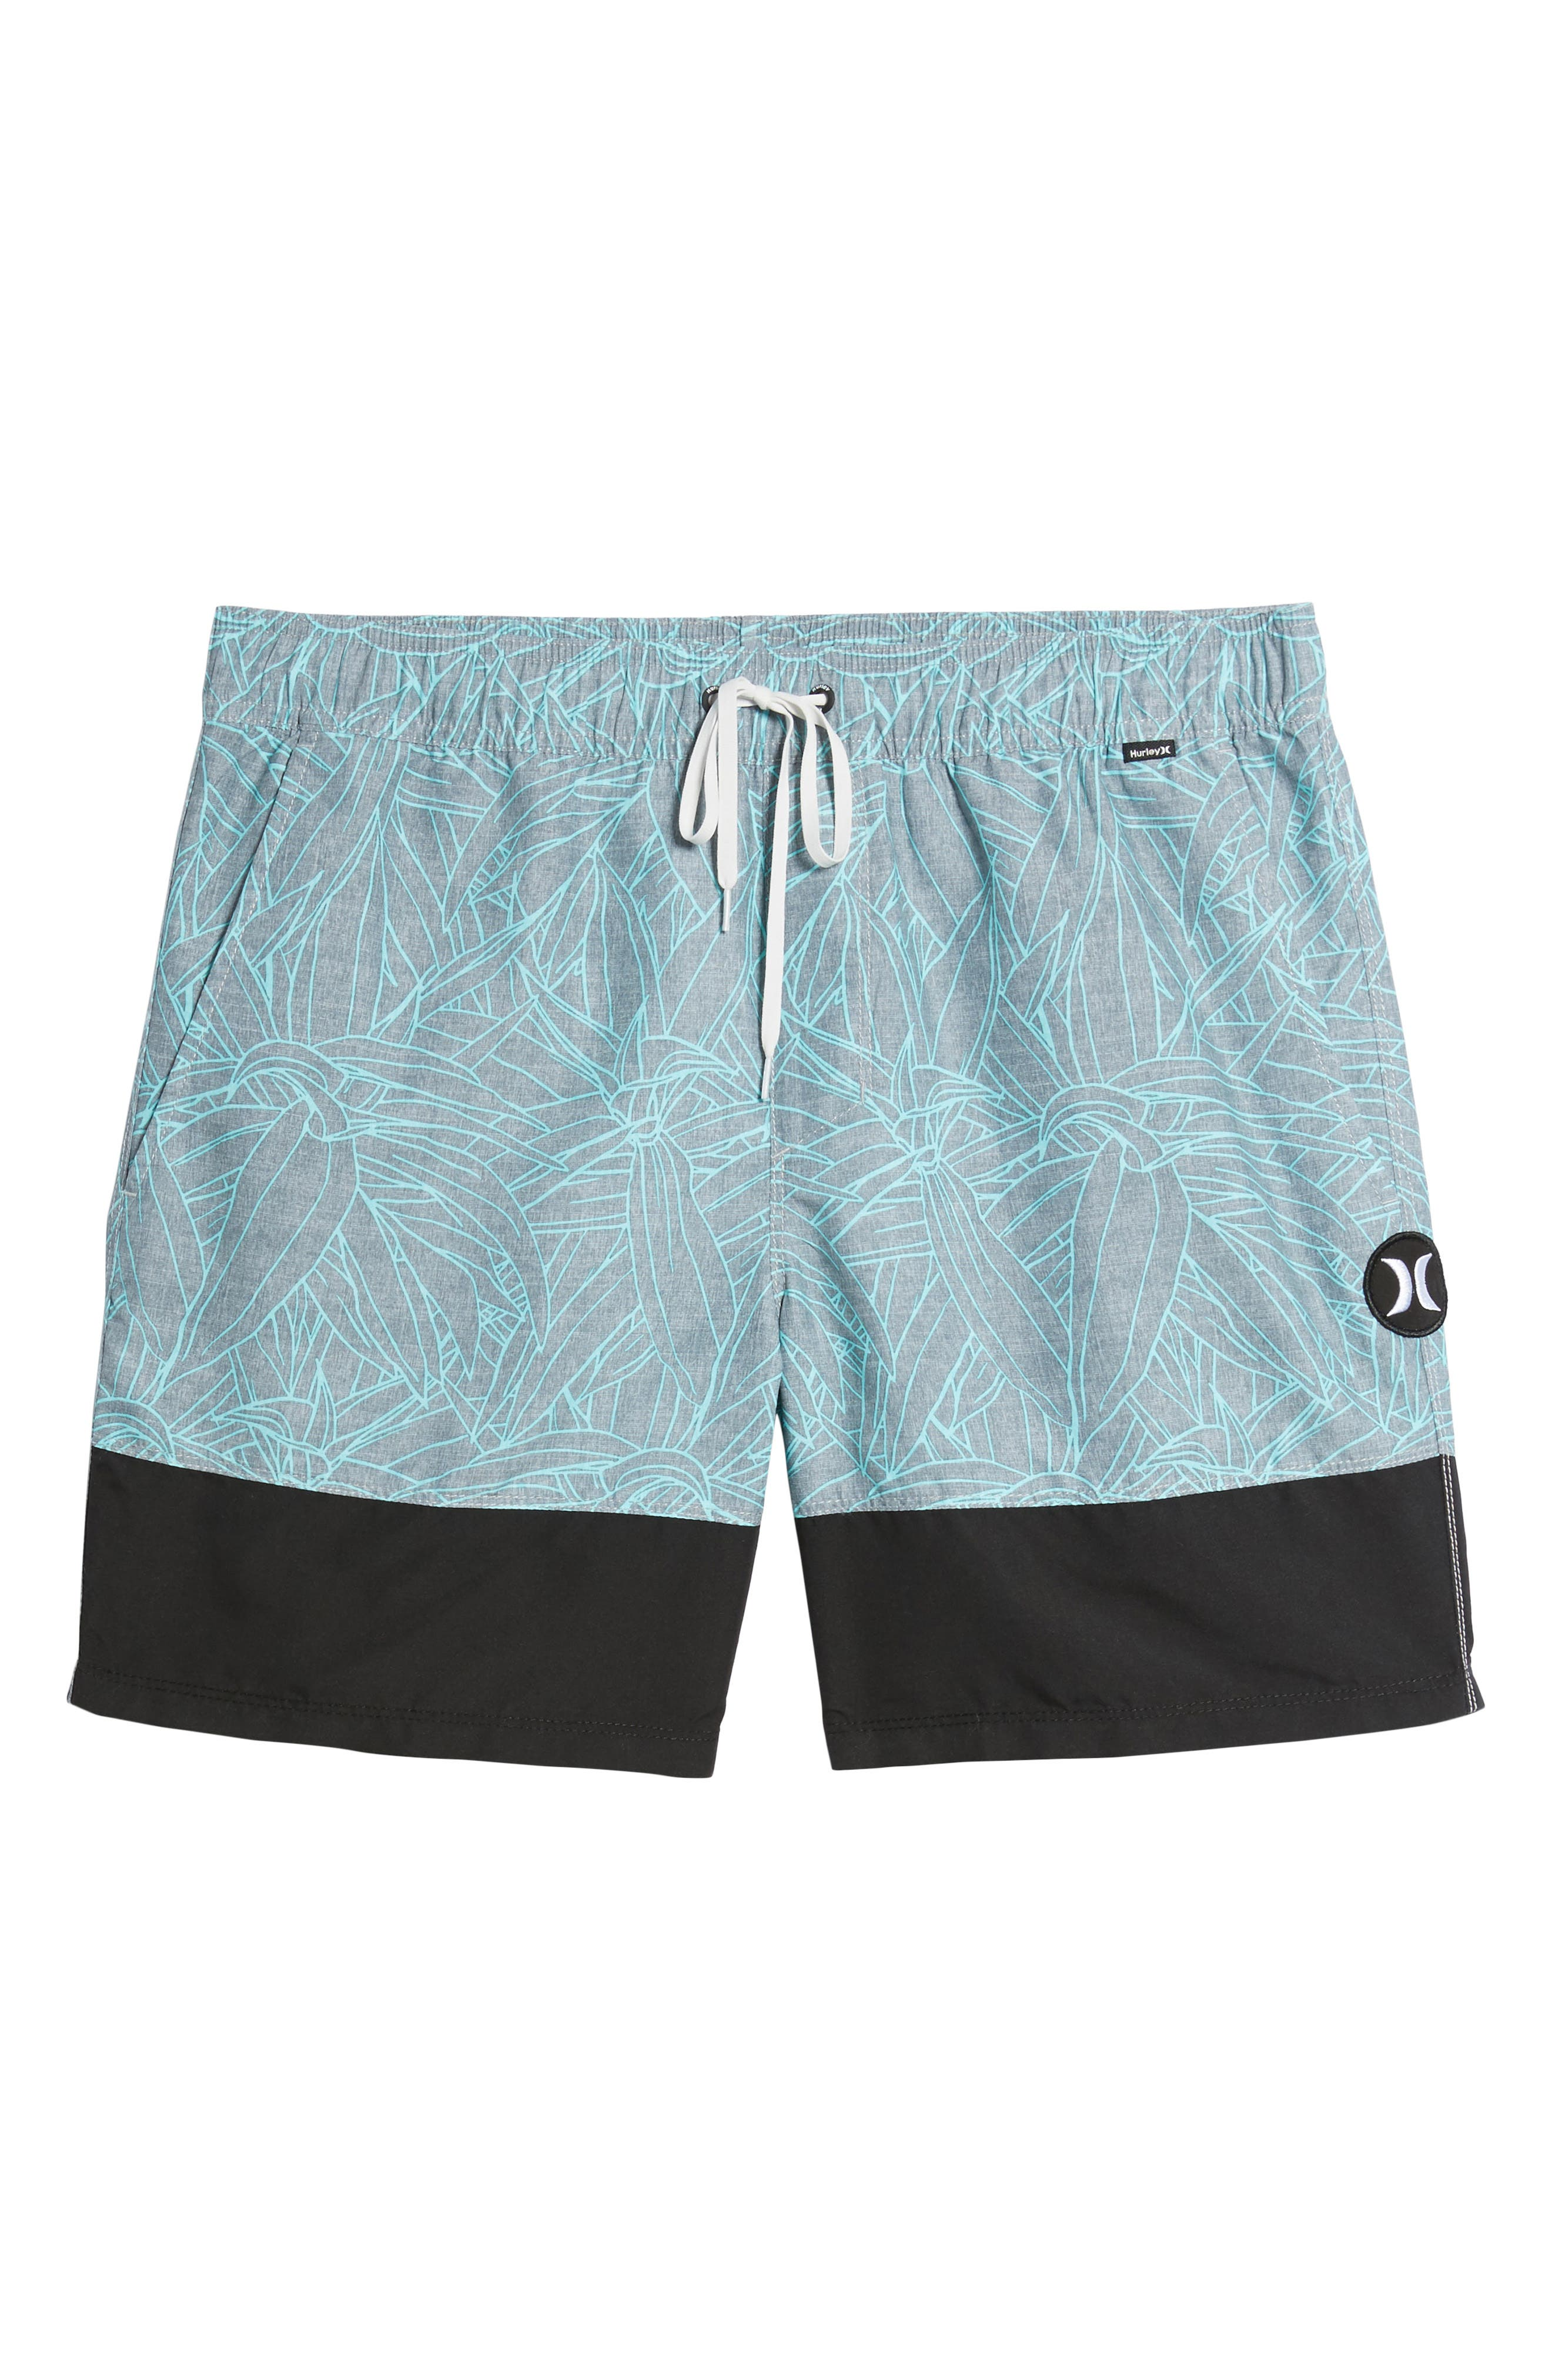 Pupkea Volley Board Shorts,                             Alternate thumbnail 11, color,